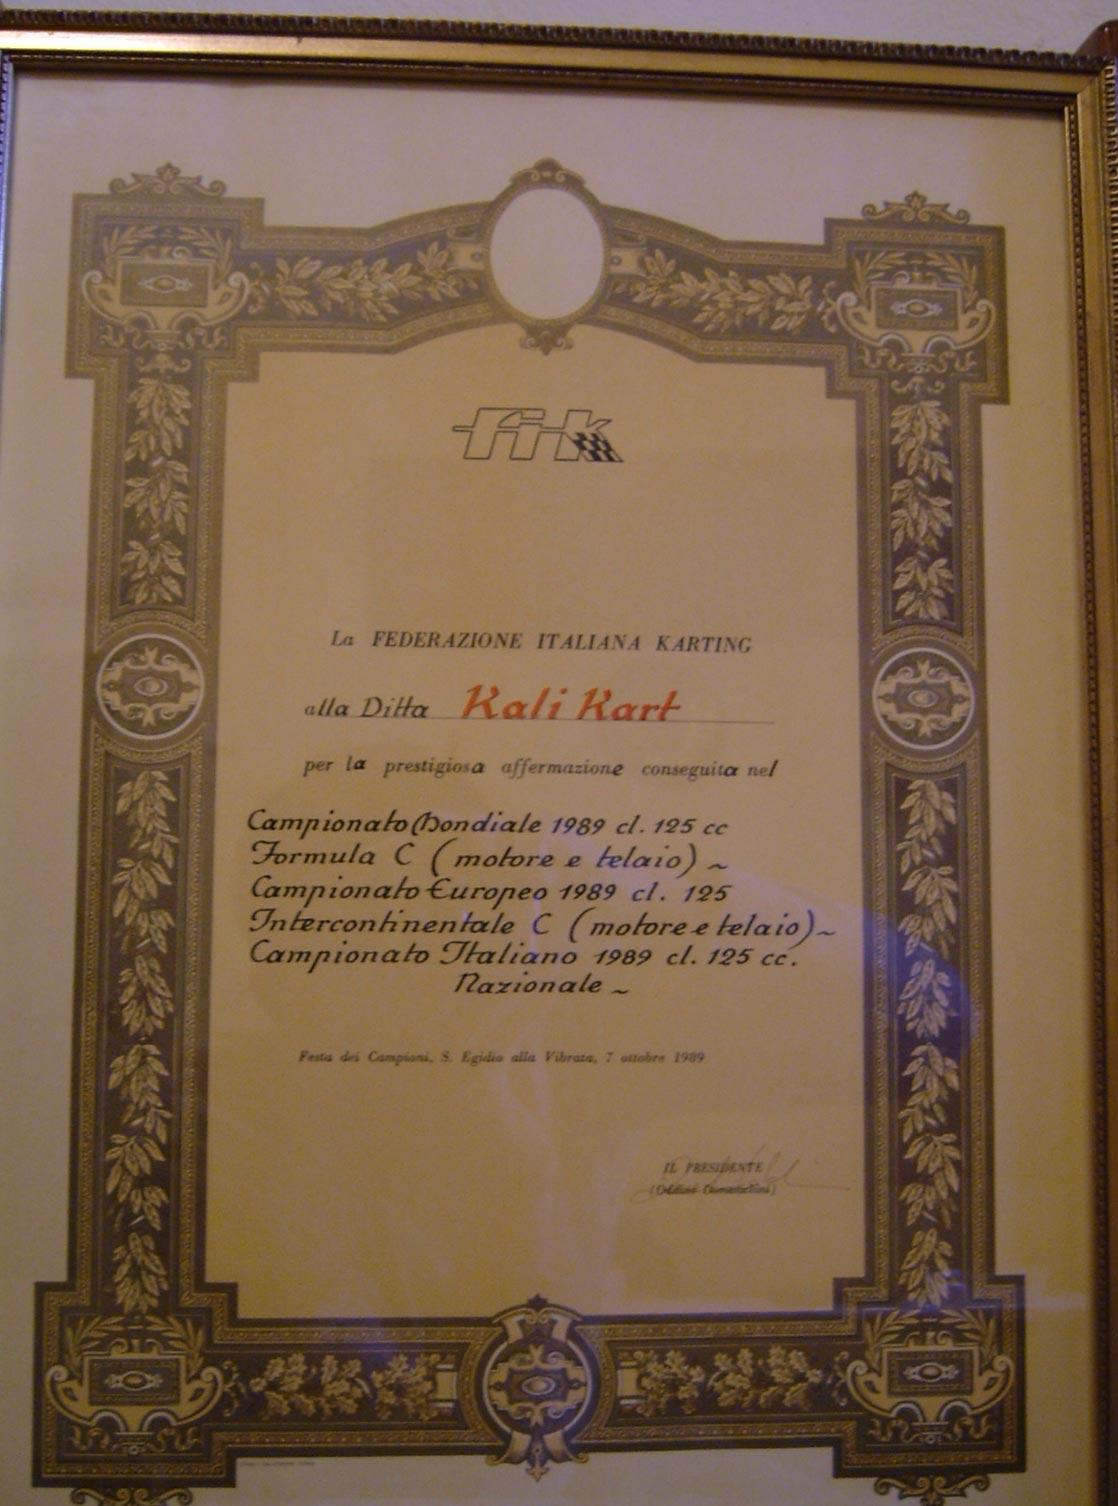 Conocer la historia de Calogero Vanaria y de la historia de Kalì Kart